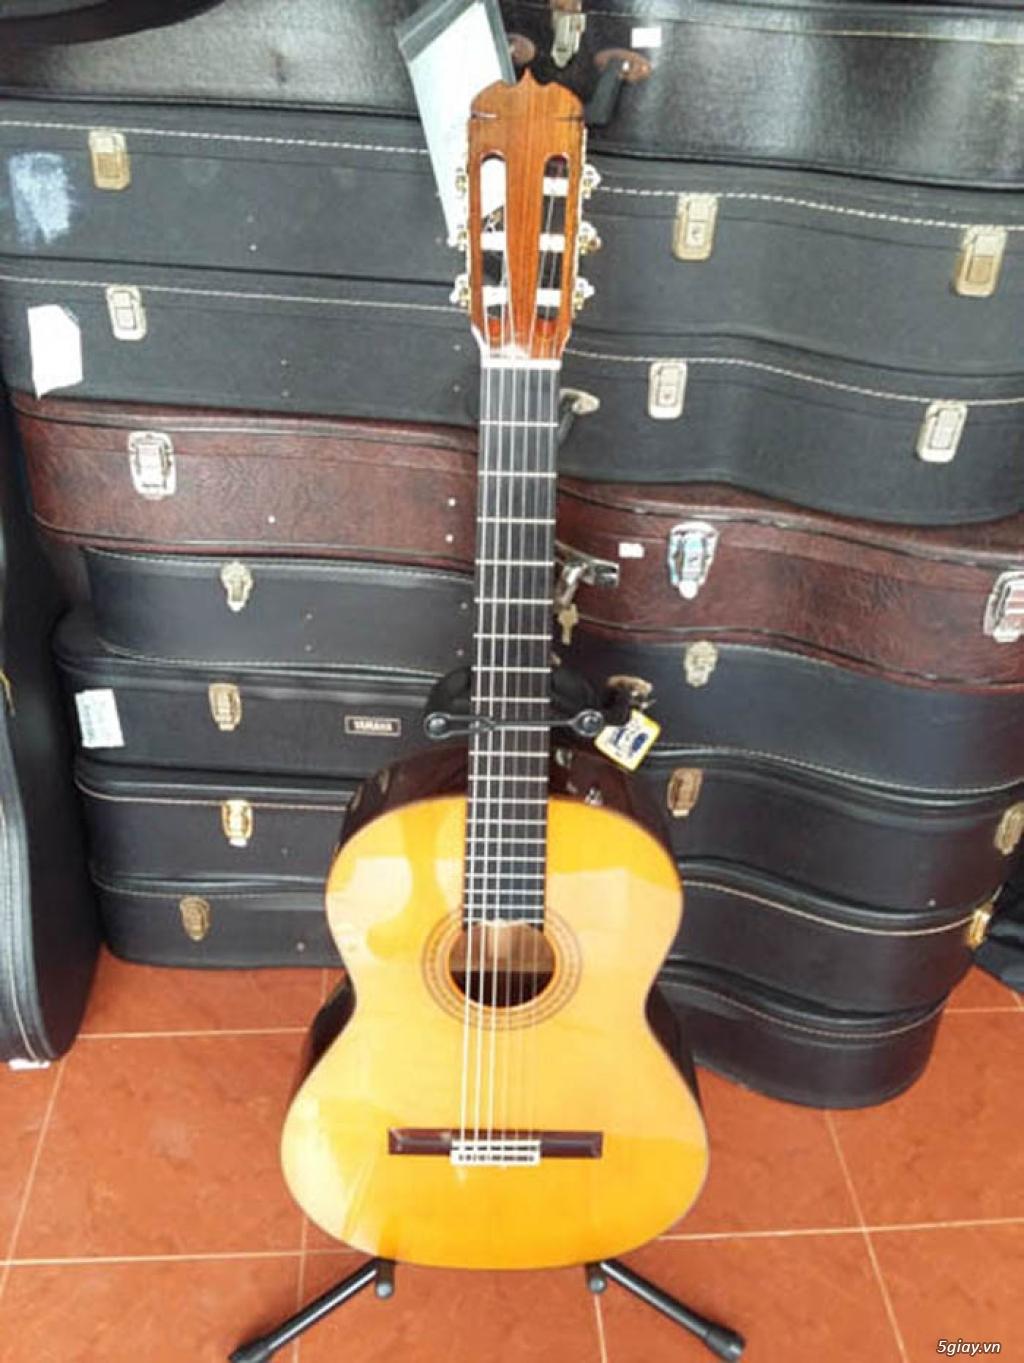 Guitar Jacaranda Matsouka M 60, No 20, Morris MC 50 và Kurosawa No 6